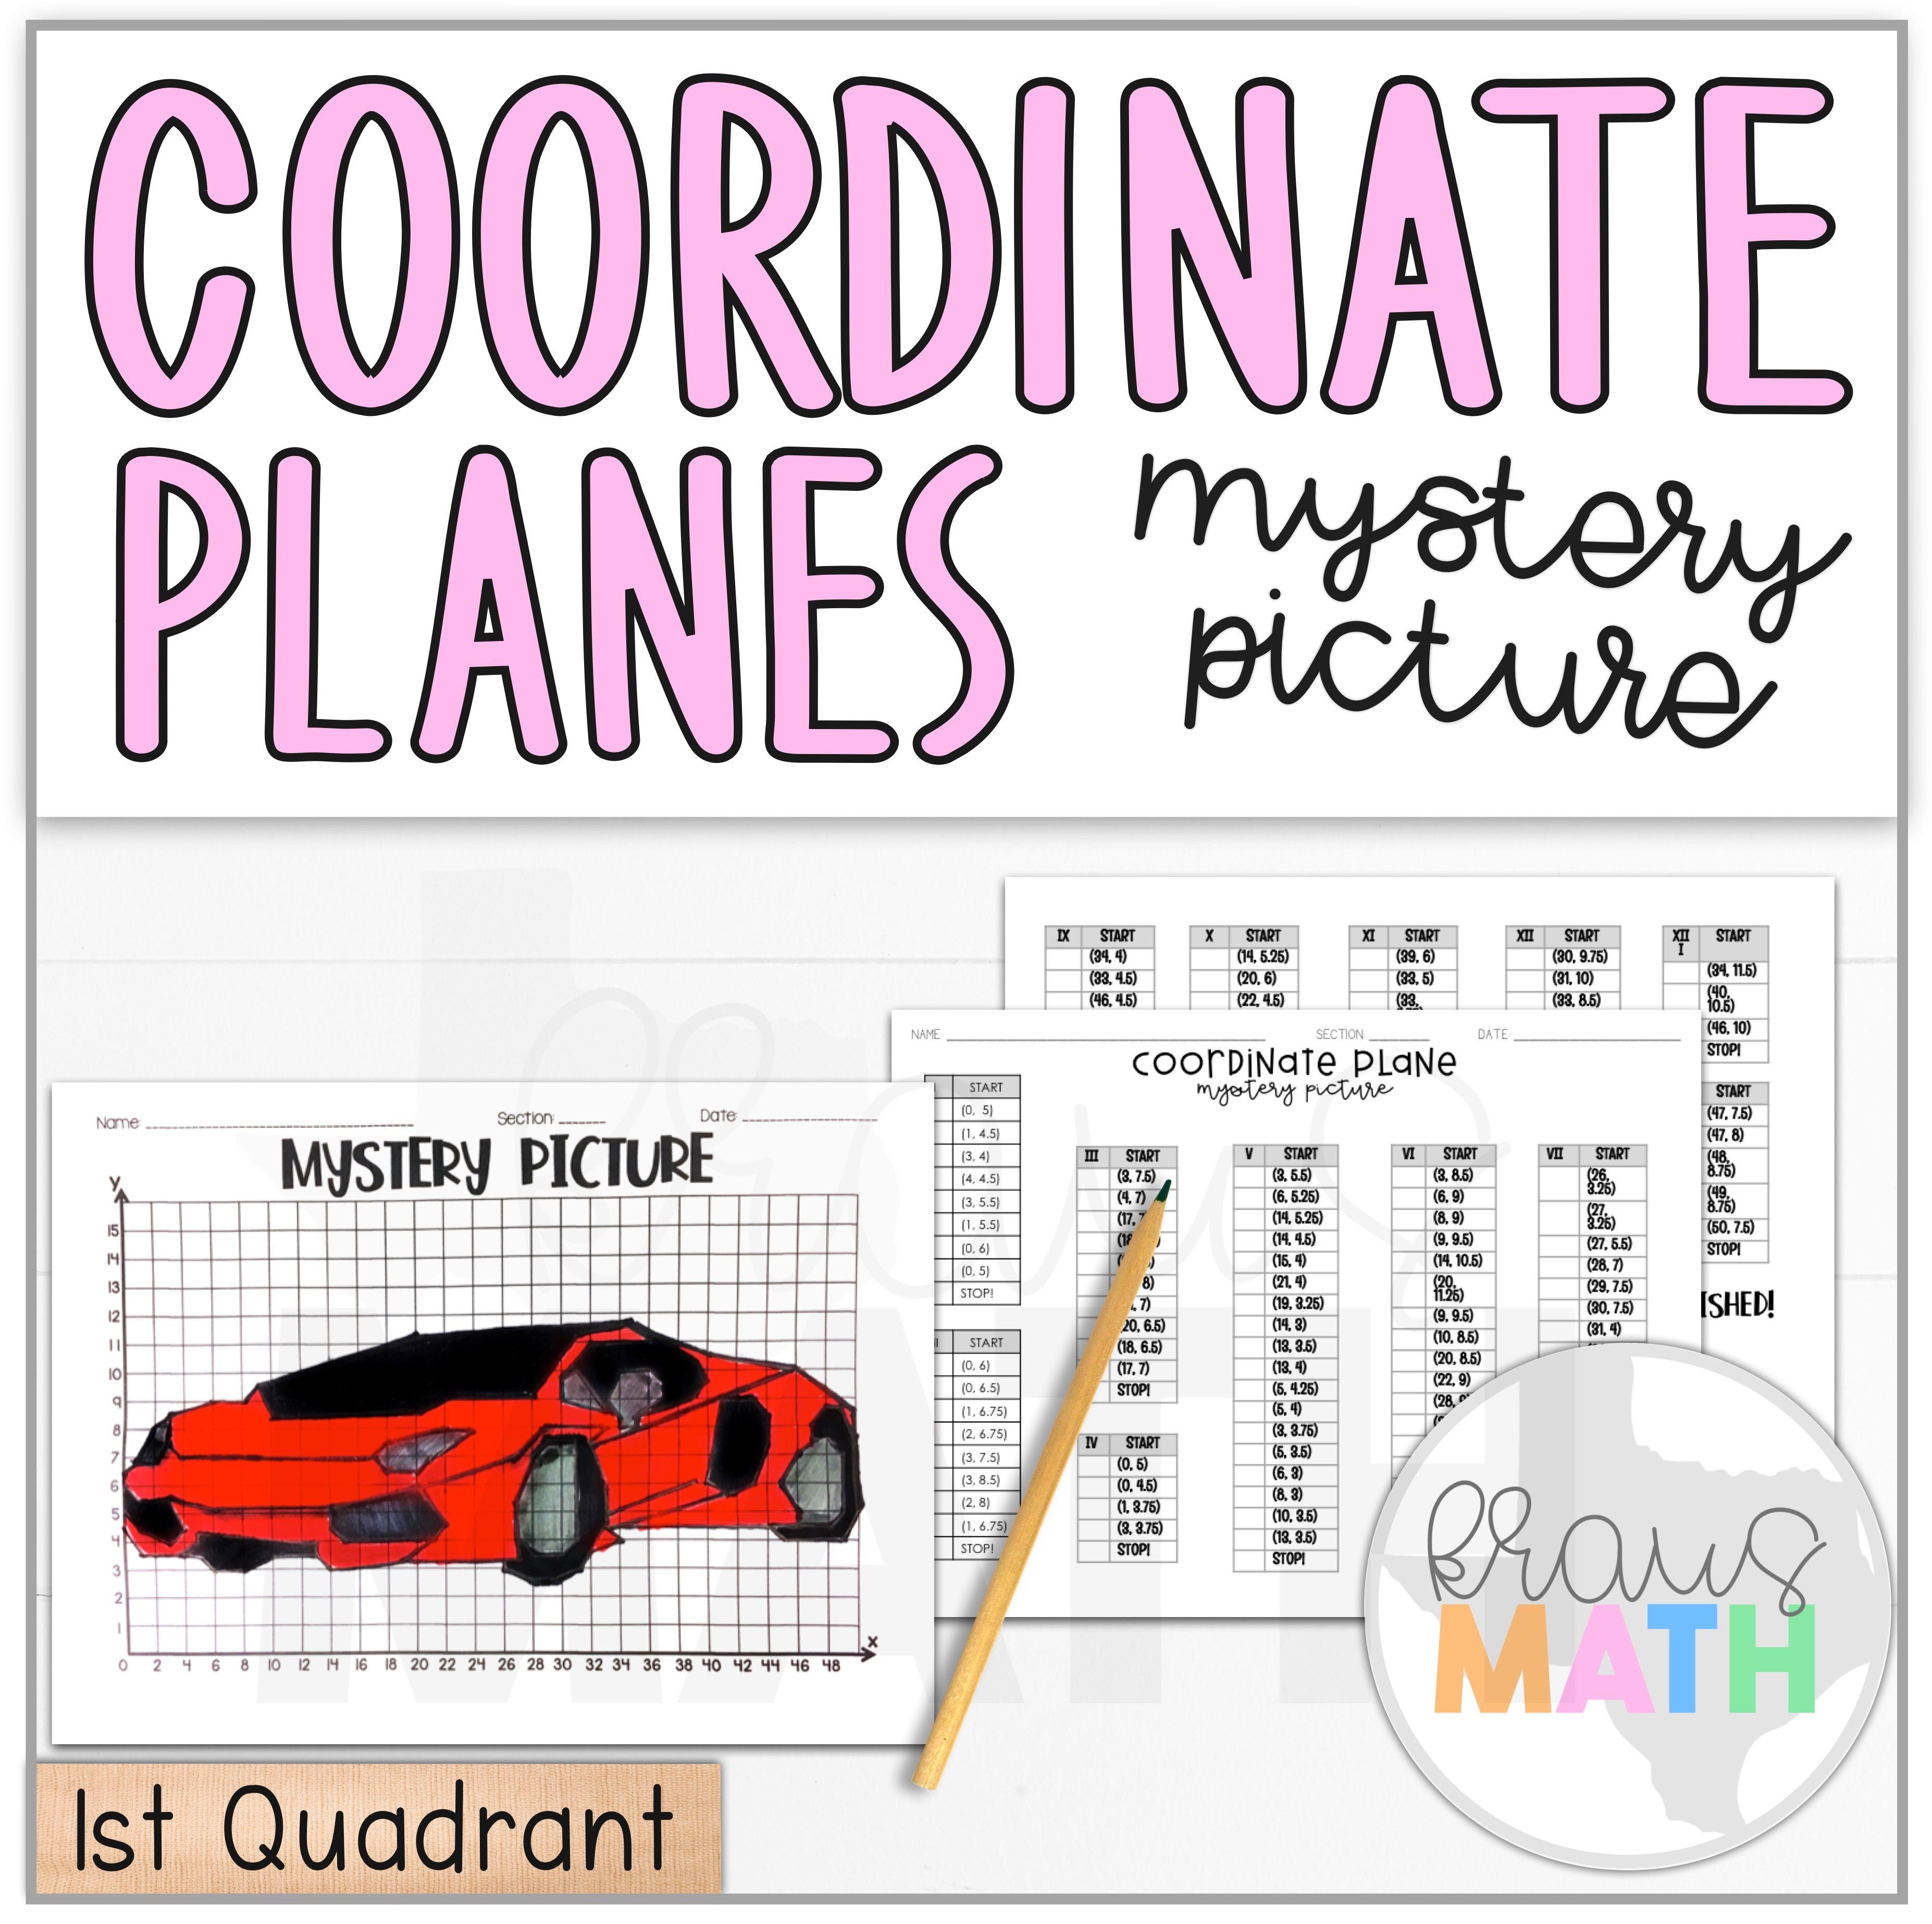 Lamborghini Sports Car Coordinate Plane Activity 1st Quadrant Coordinate Plane Graphing Coordinate Plane Activity Coordinate Plane